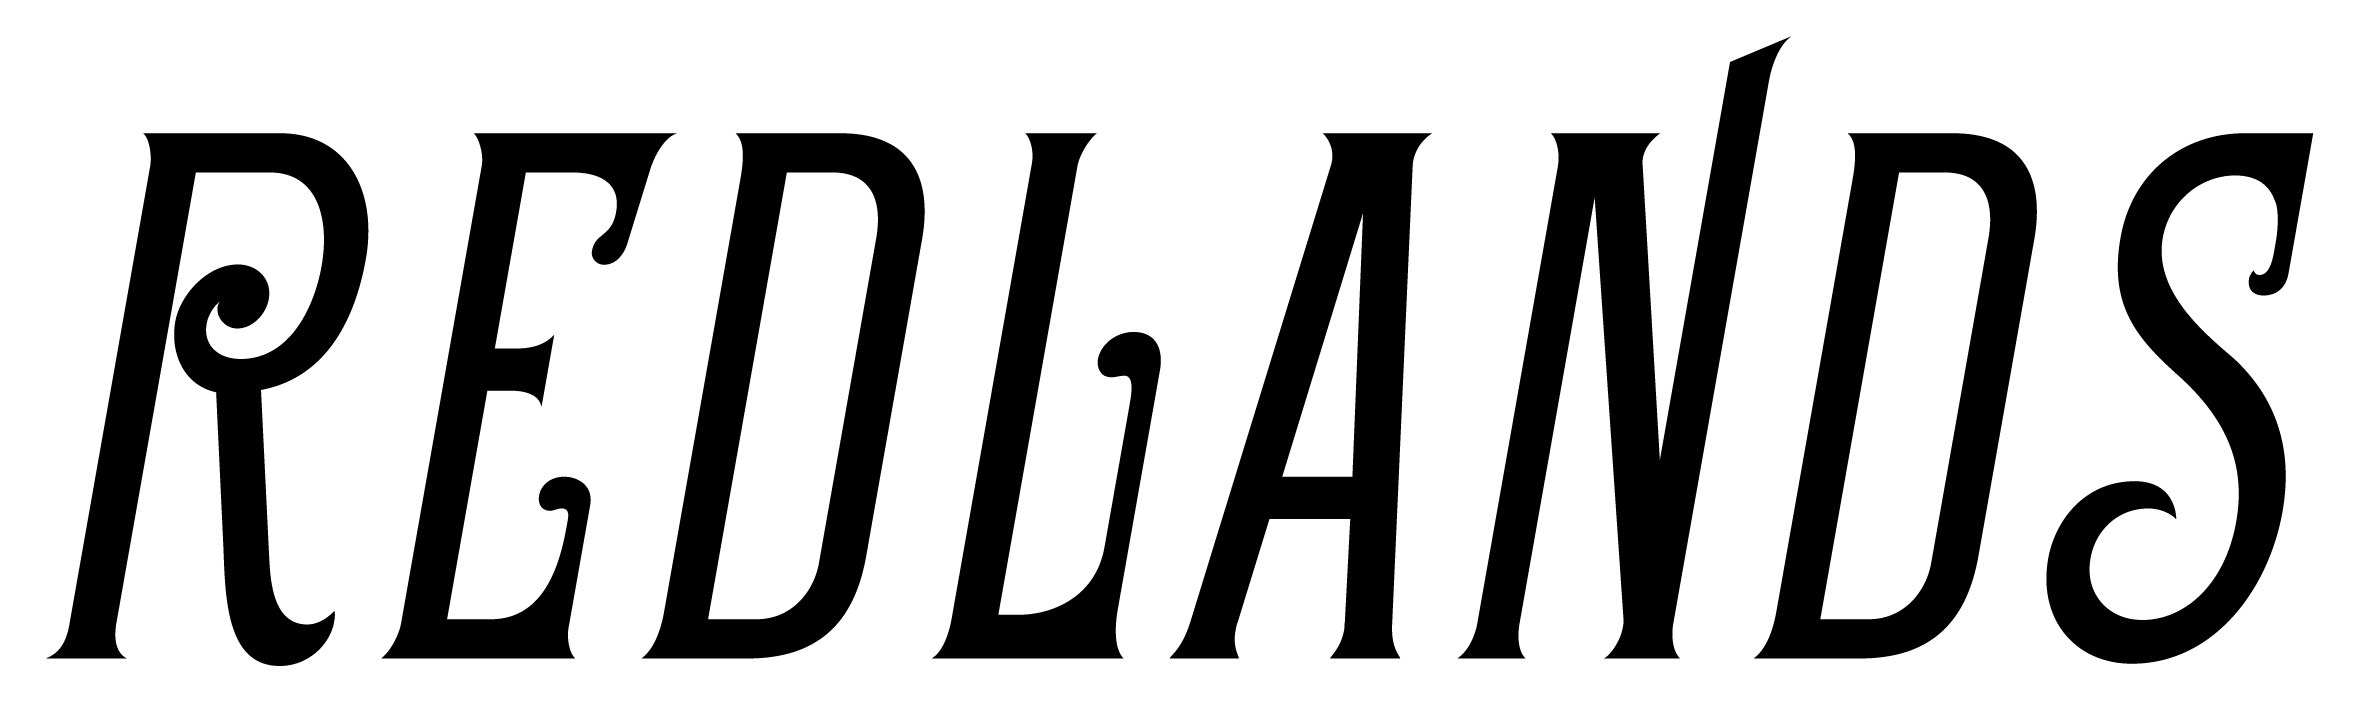 REDLANDS ONLINE STORE